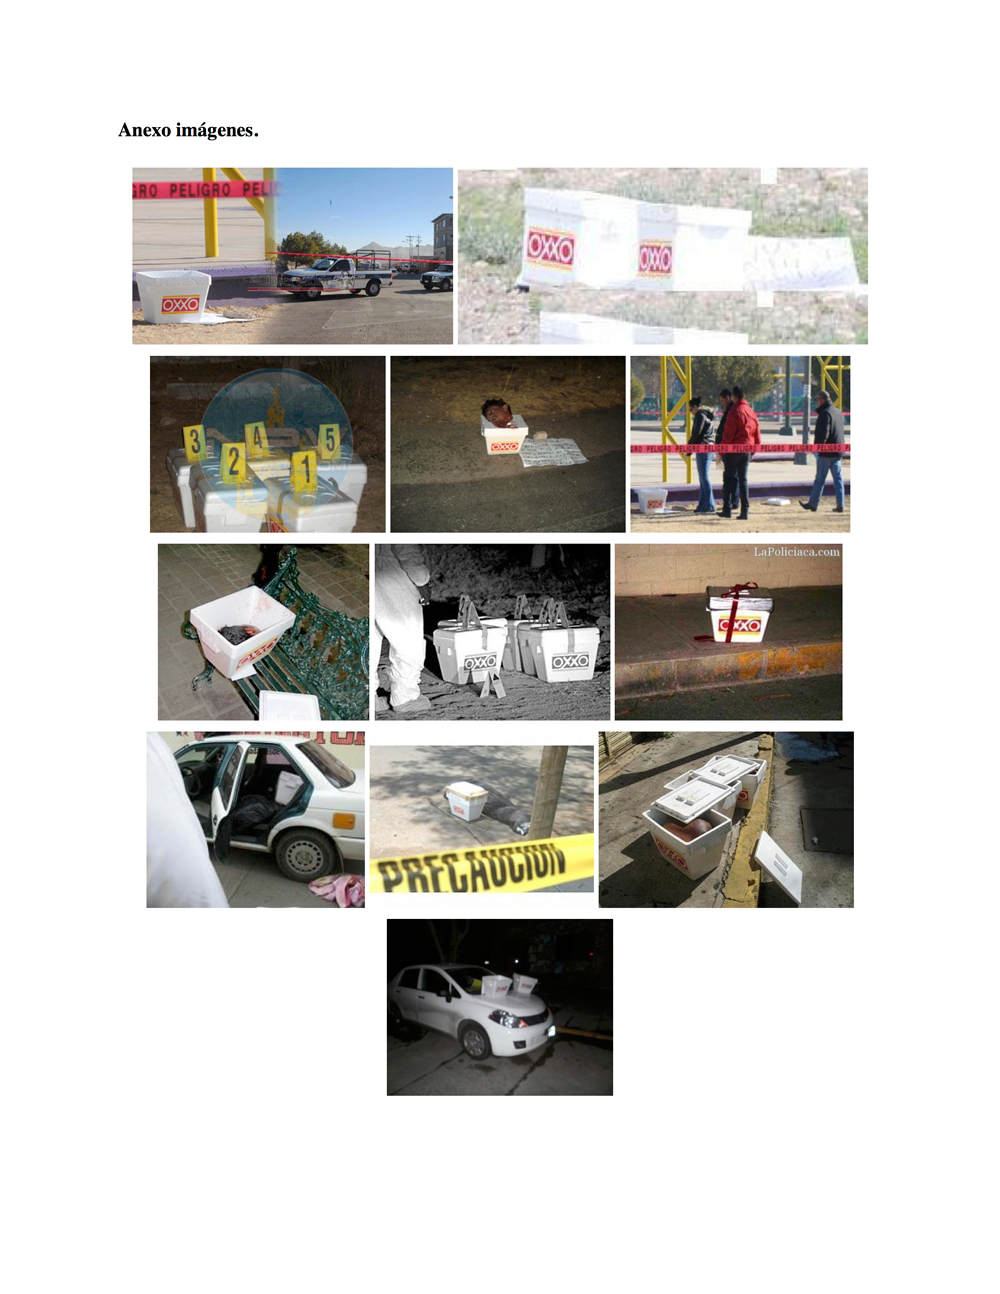 Caja Oxxo (Profanación), Alejandro Luperca, PDF, 7 págs., 2012.